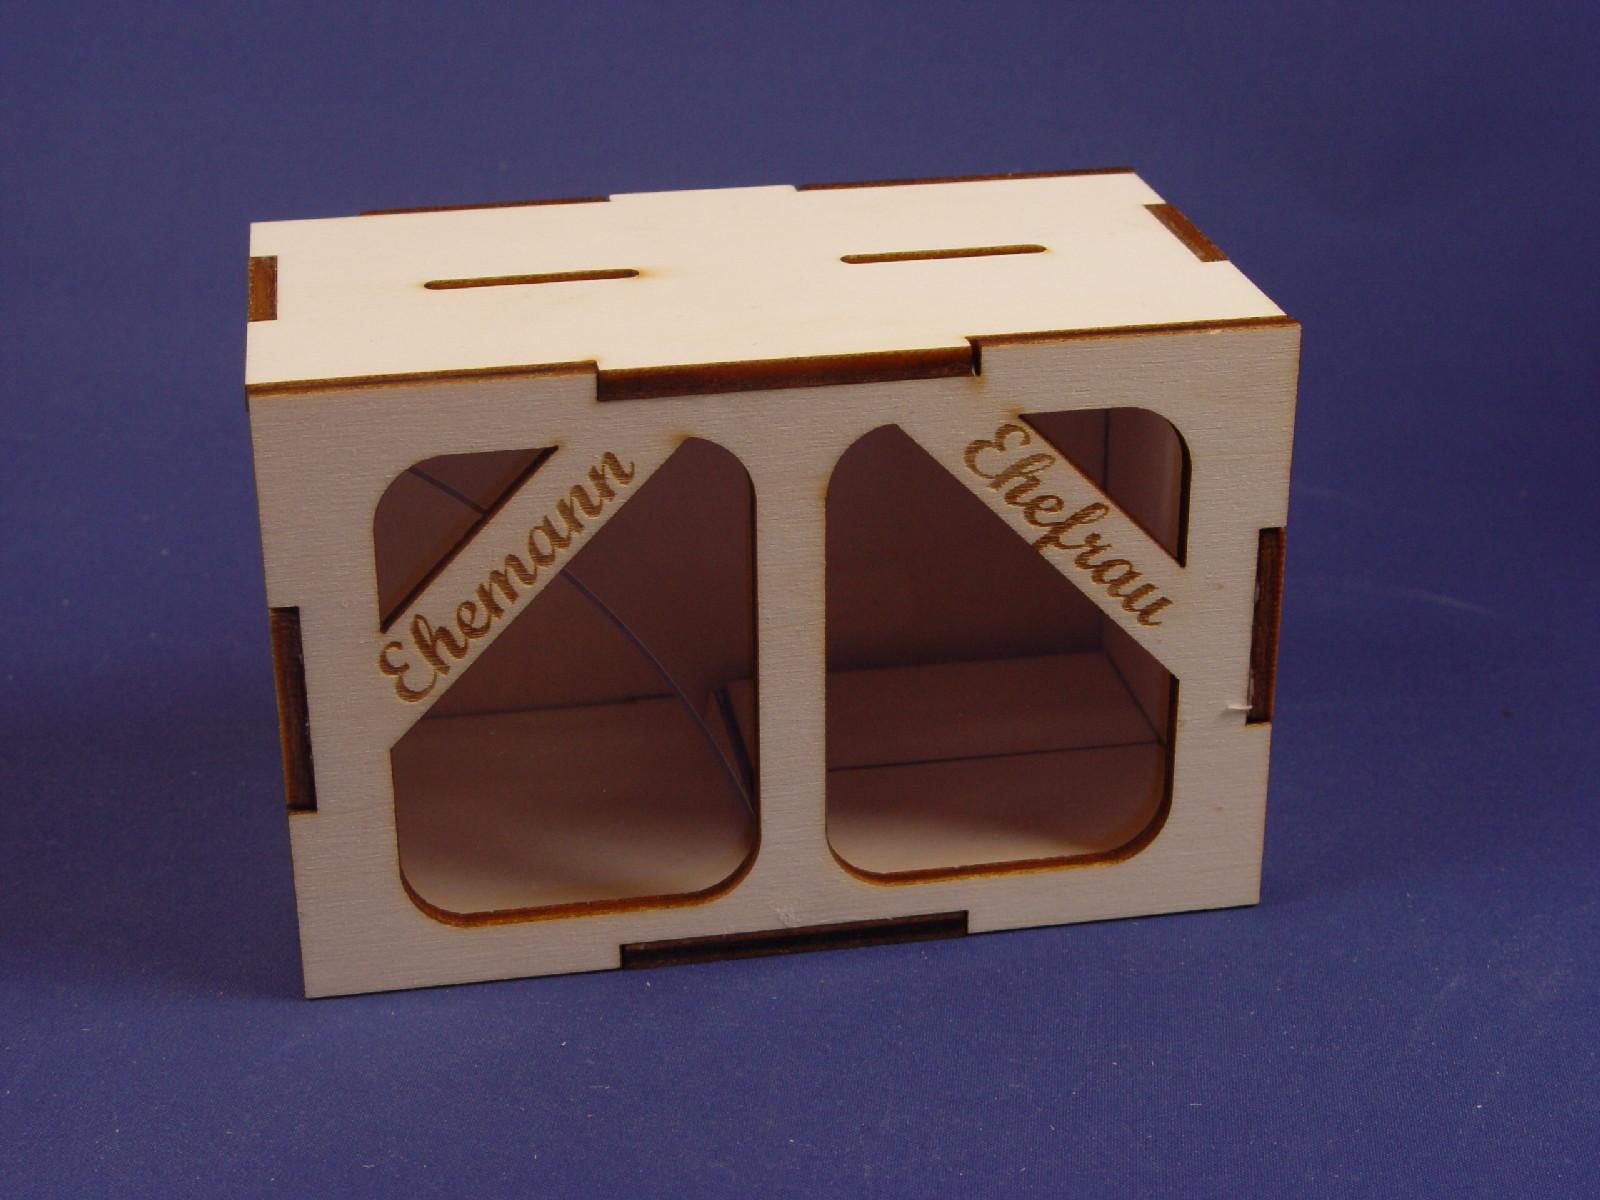 cnc monkey spardose hochzeit ehemann ehefrau. Black Bedroom Furniture Sets. Home Design Ideas